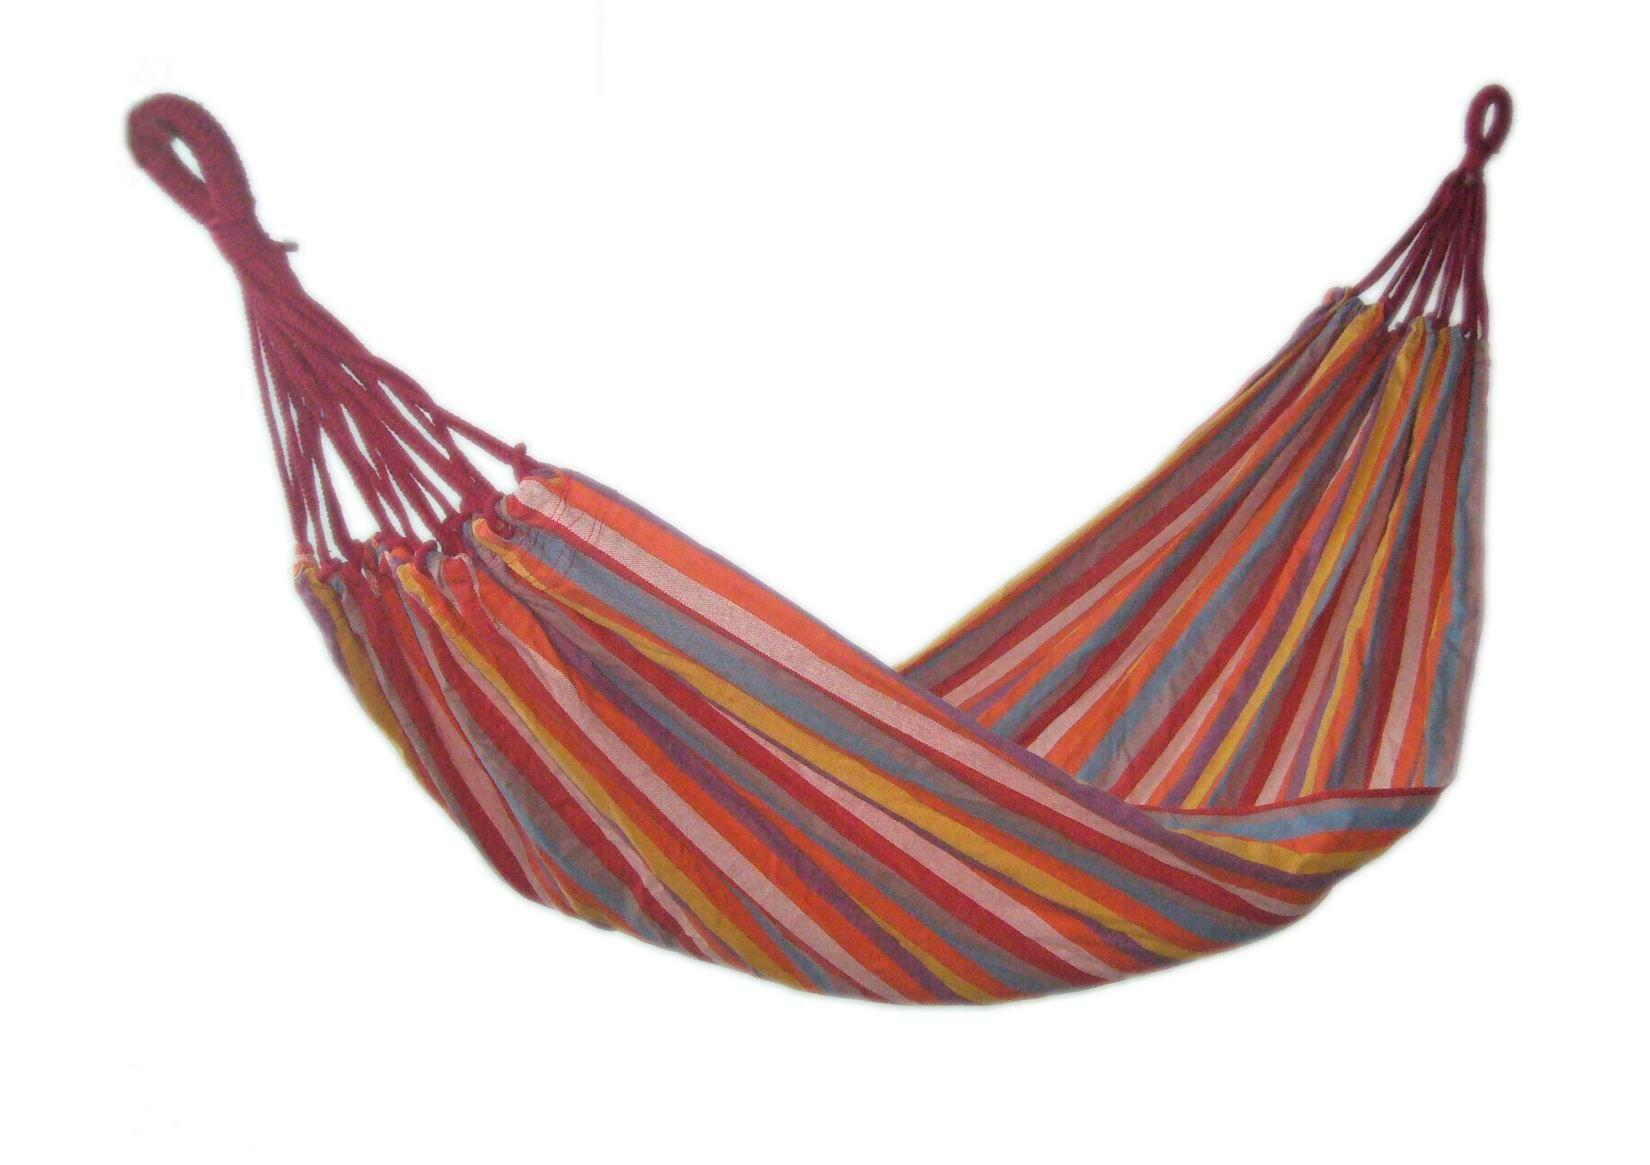 Travel parachute folding fabric hammock bed hammocks hamacas